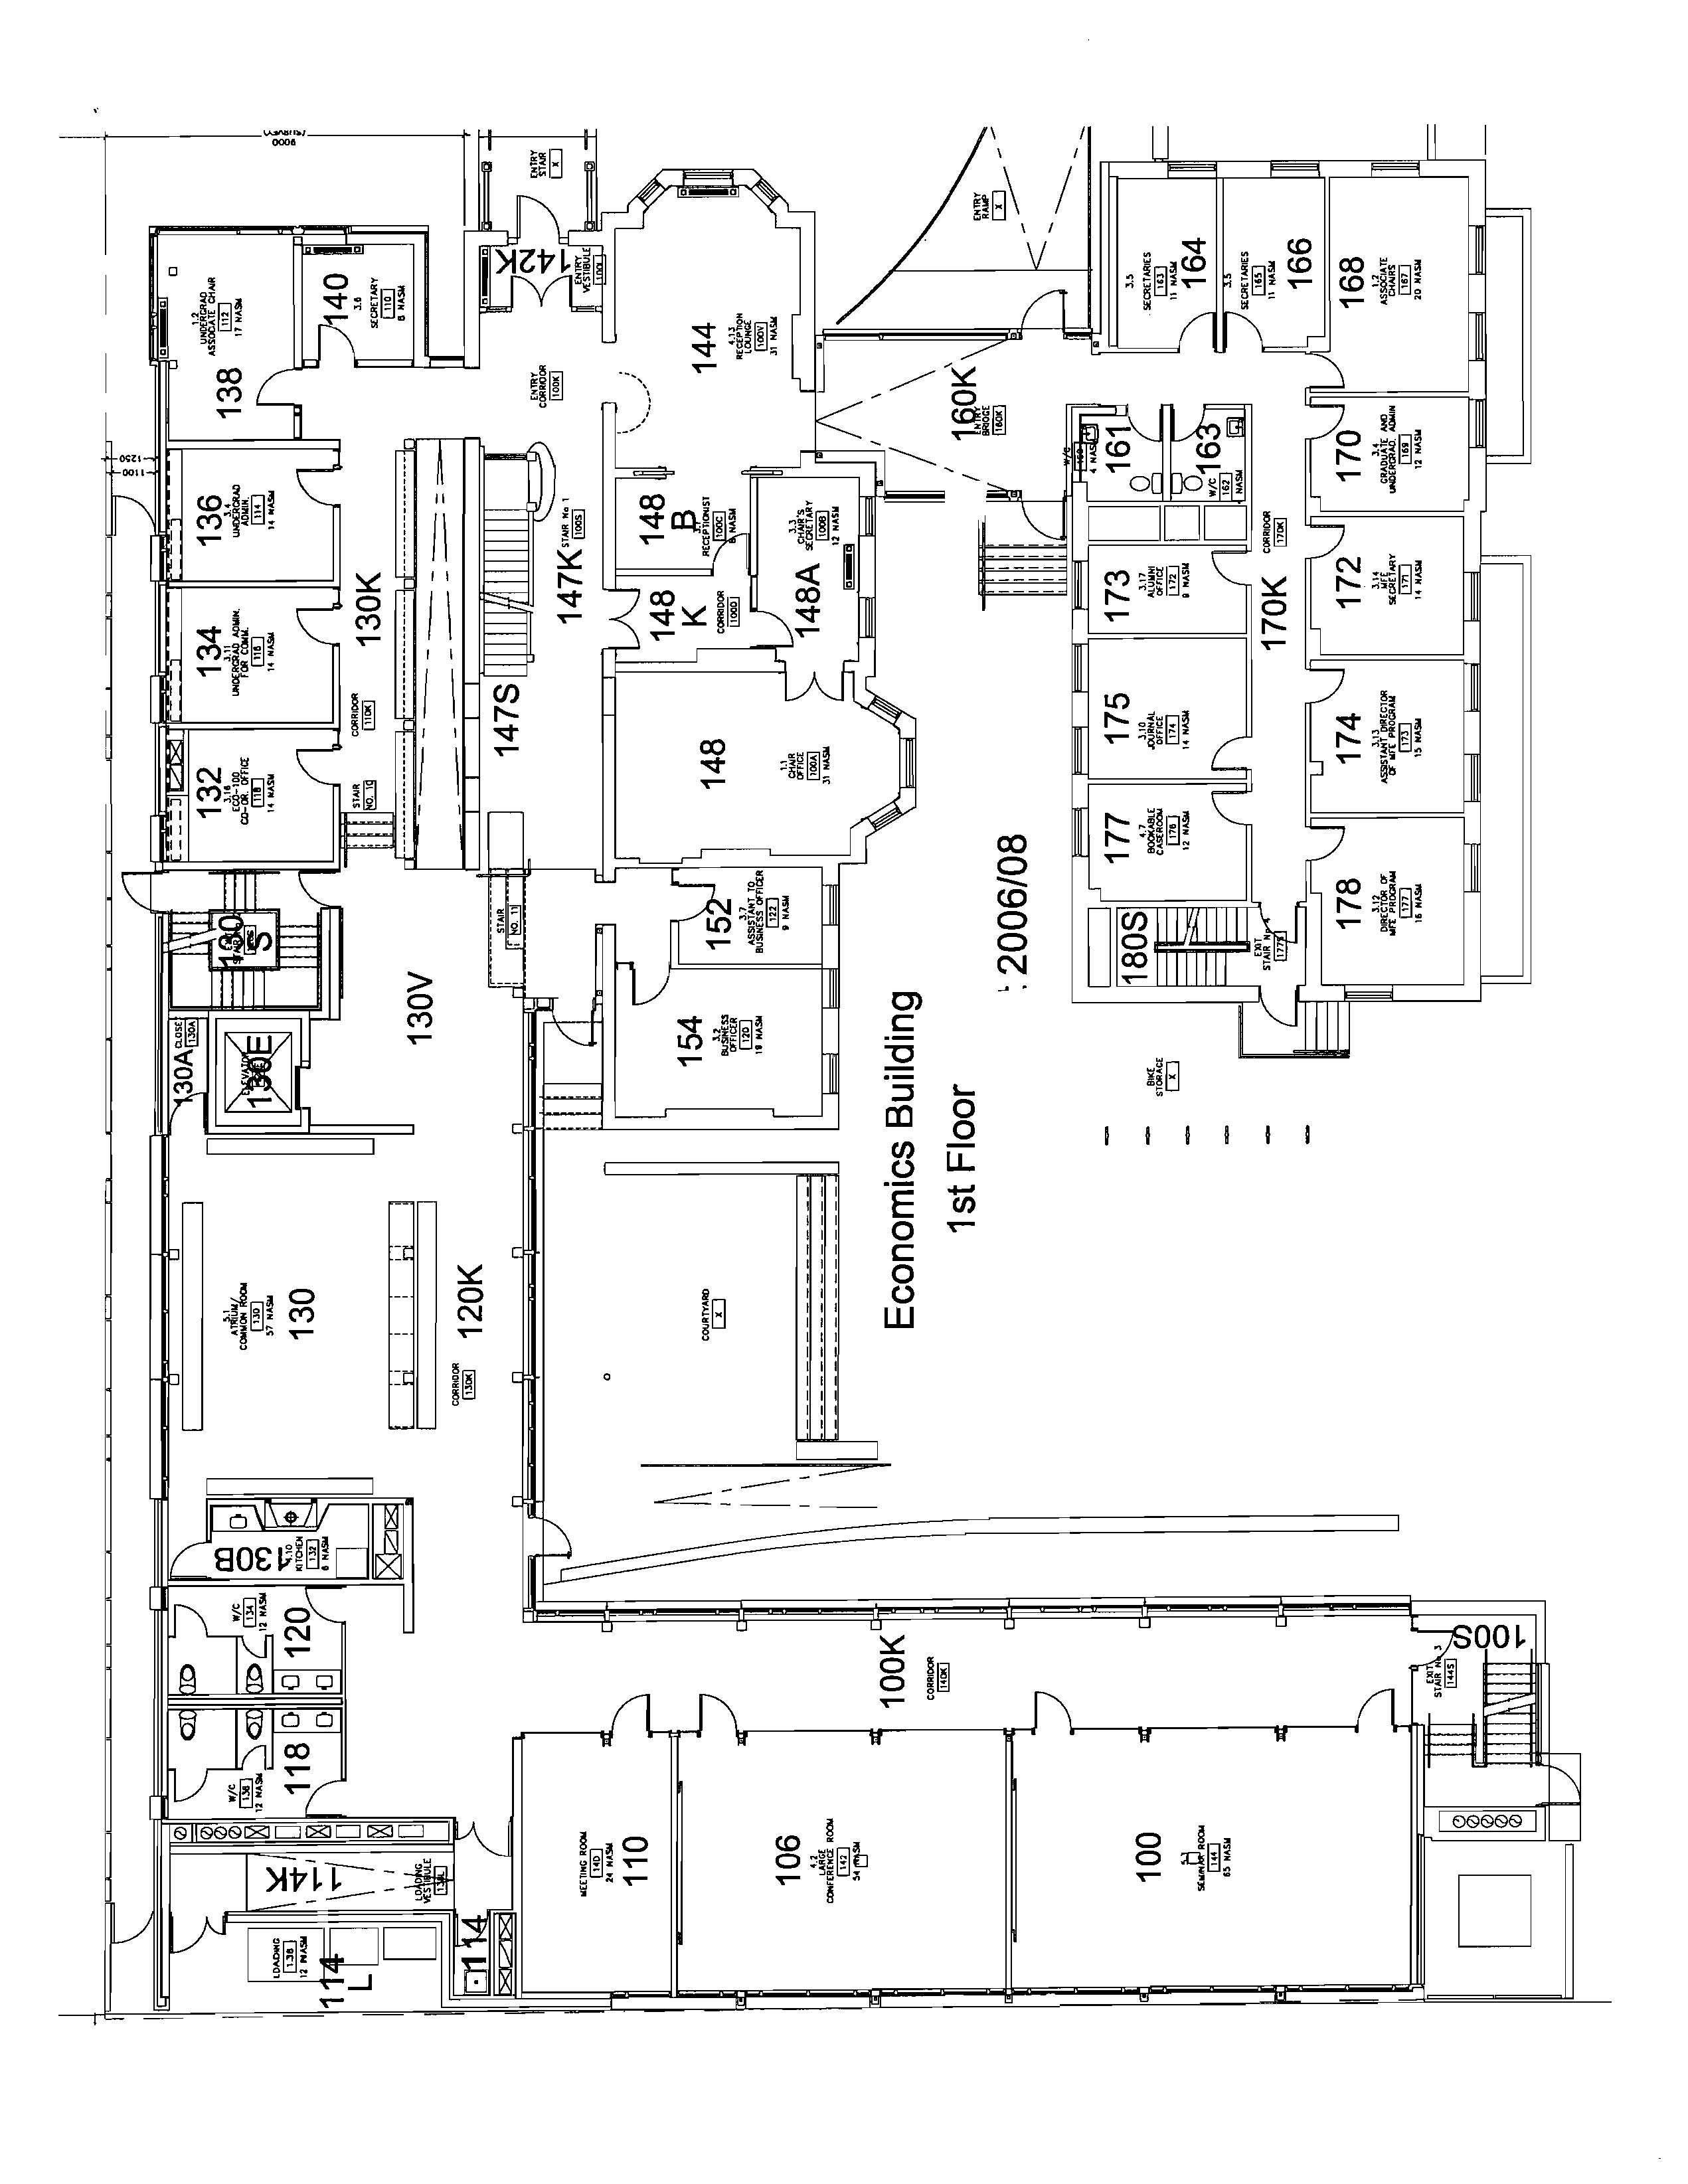 U of T : Economics : Overview of the Economics Building